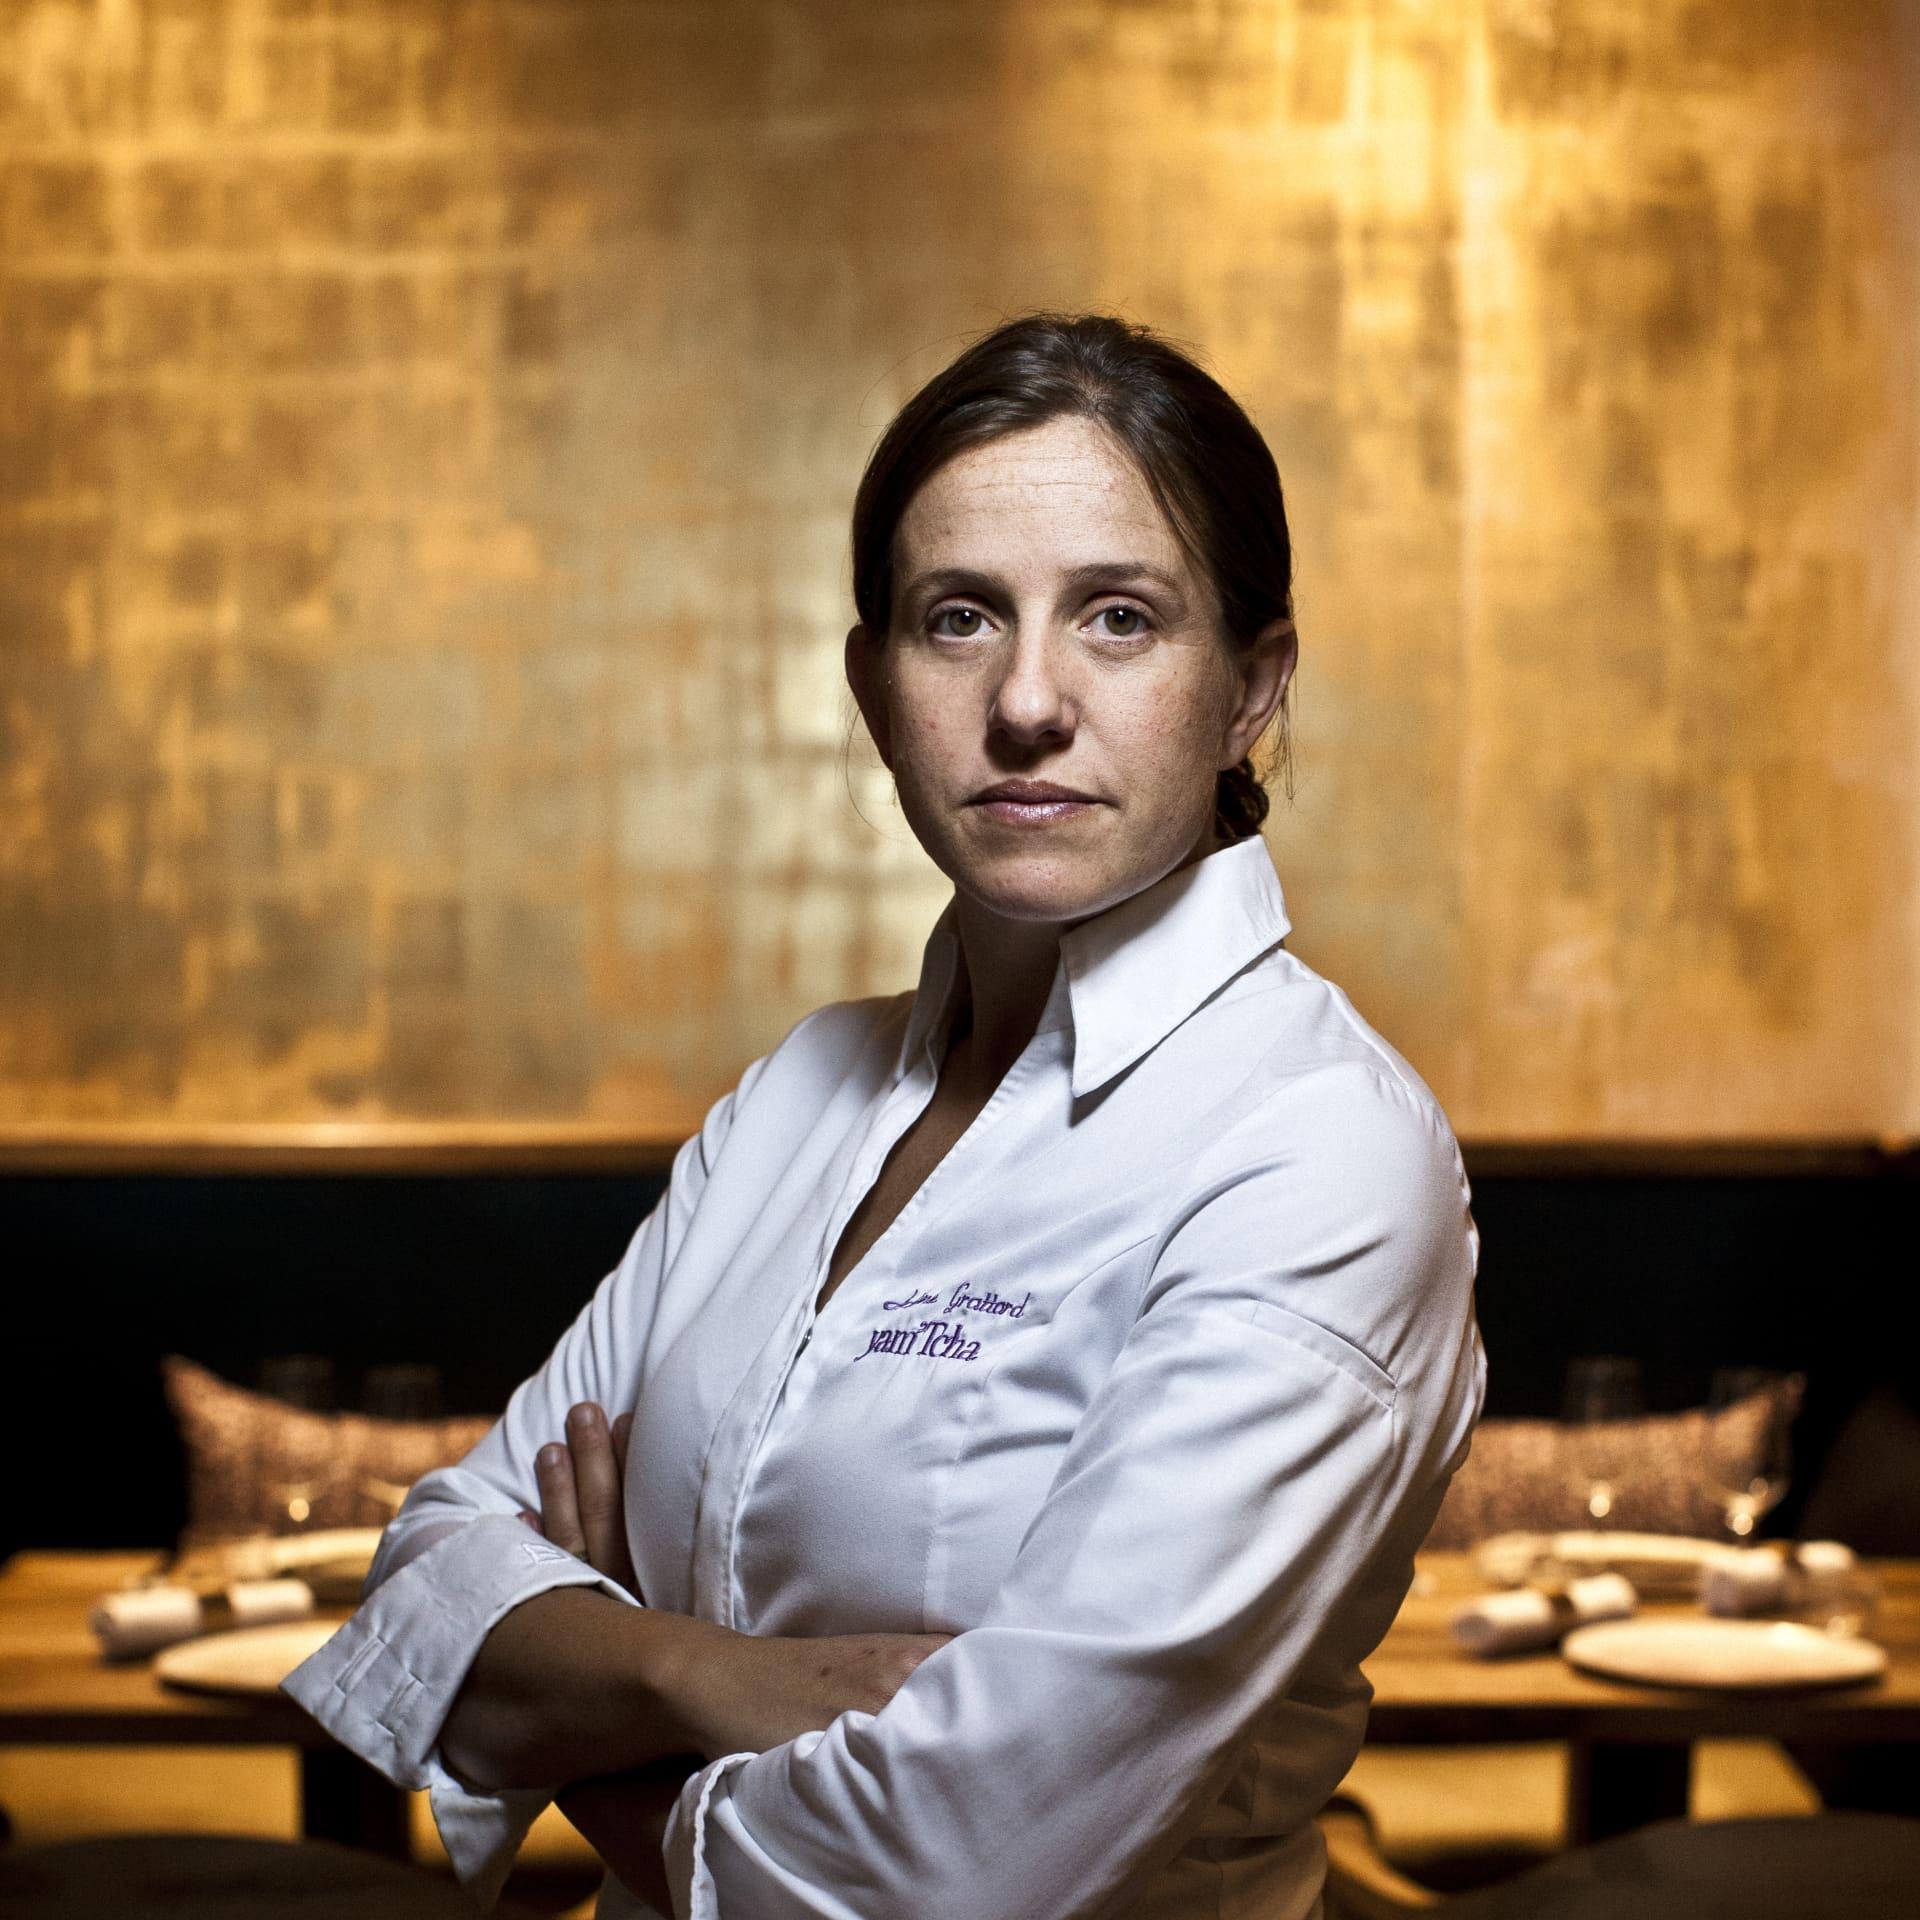 Chef Adeline Grattard.